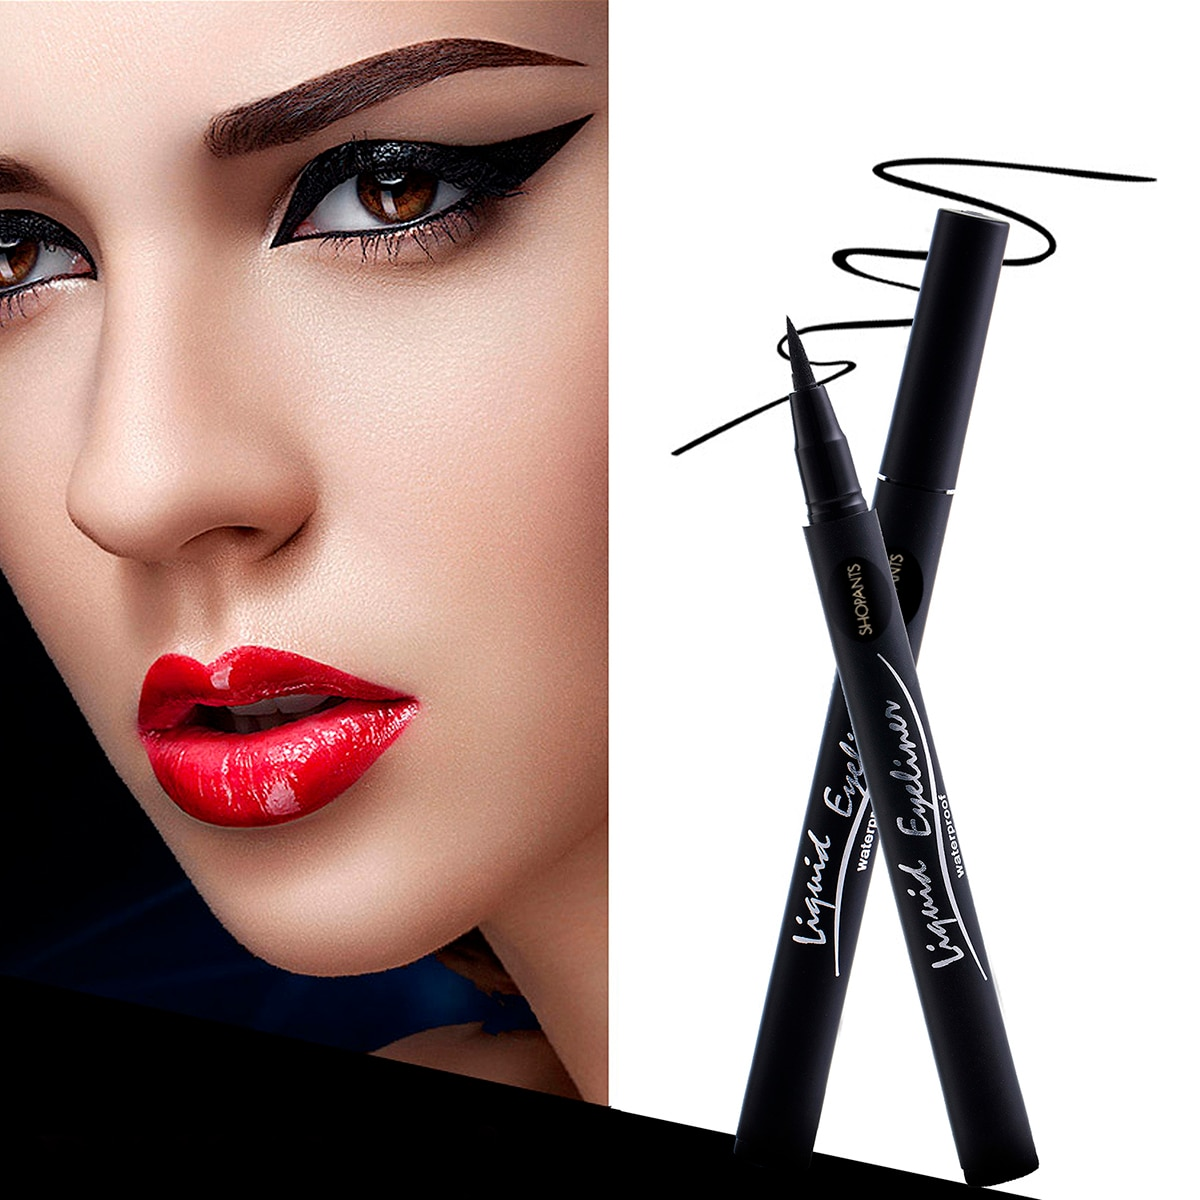 SHOPANTS 1pcs Professional Long-lasting Eyeliner Pencil Waterproof Eyeliner Liquid Eyeliner Pen Makeup Eye Liner Pencil недорого